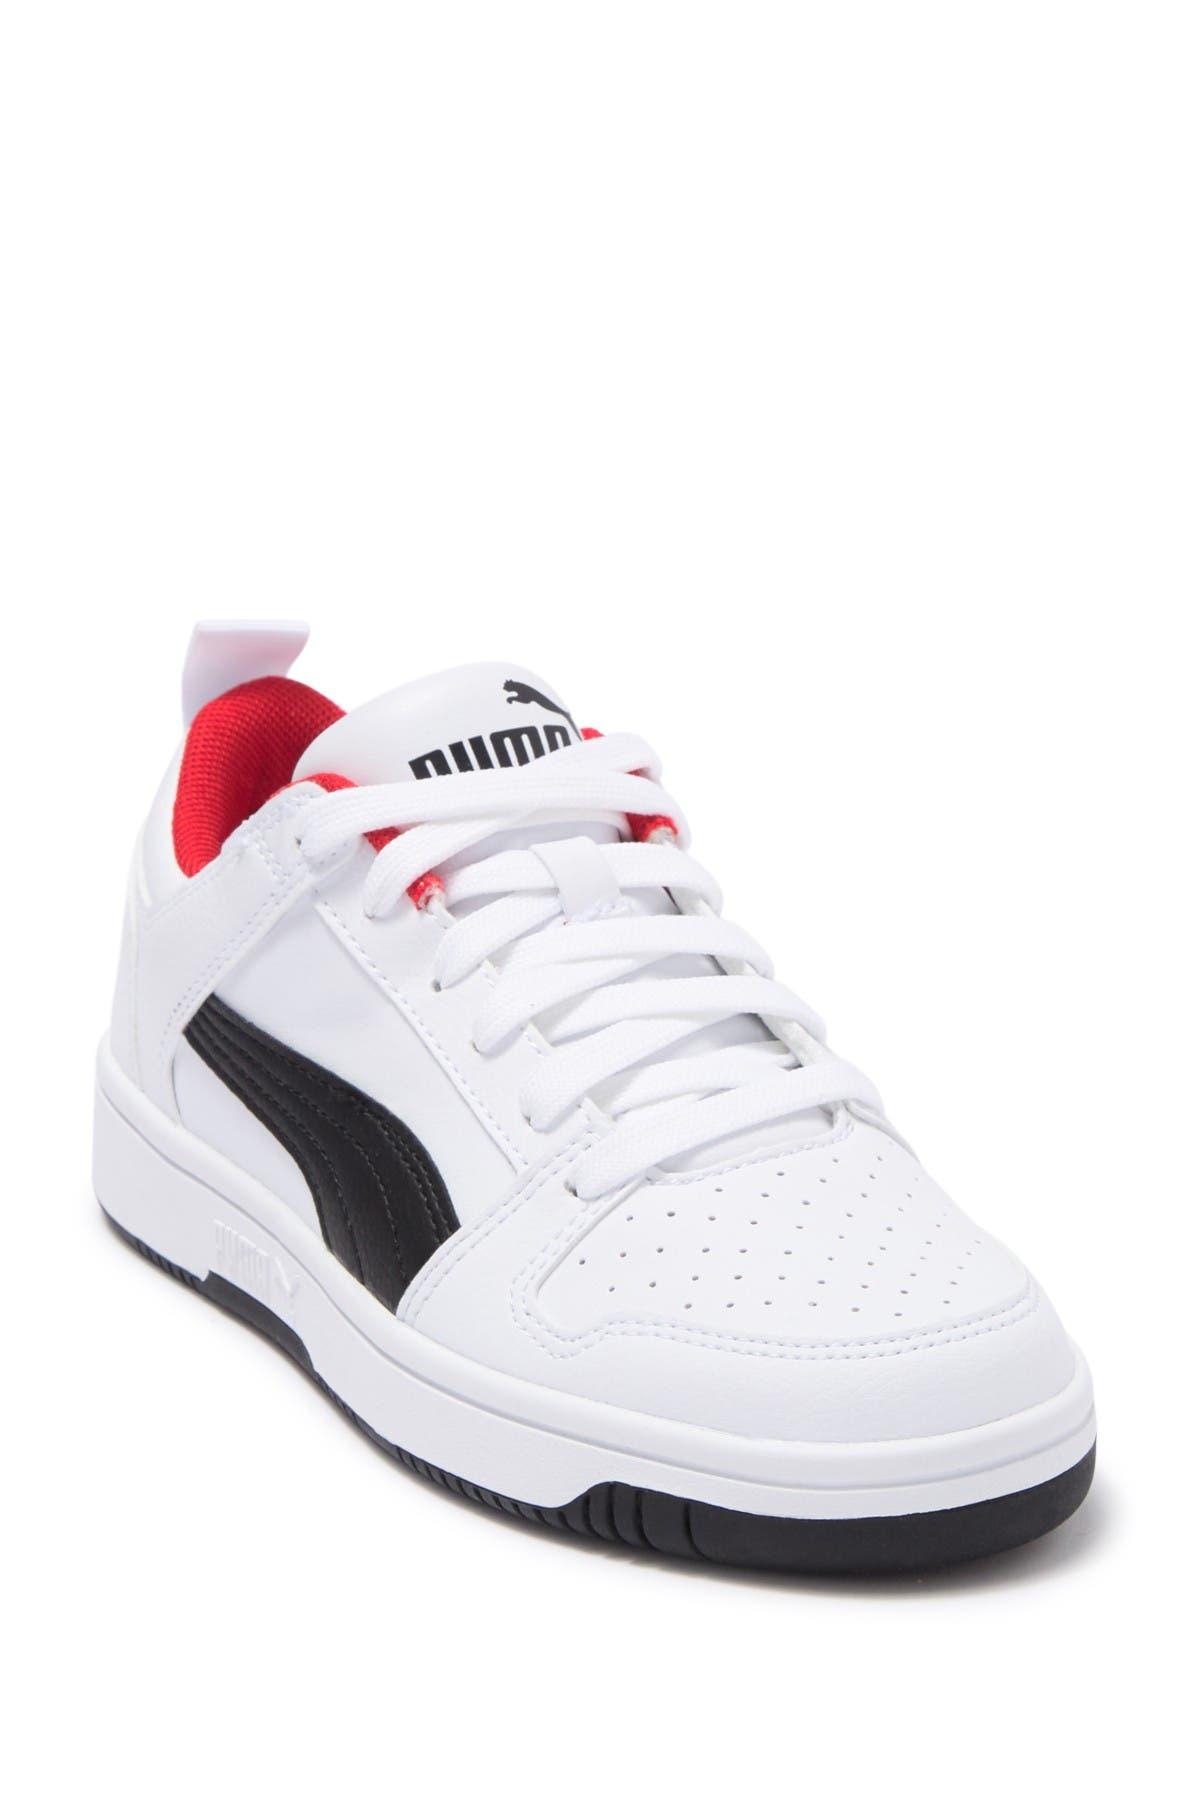 PUMA | Rebound Layup Lo Sneaker